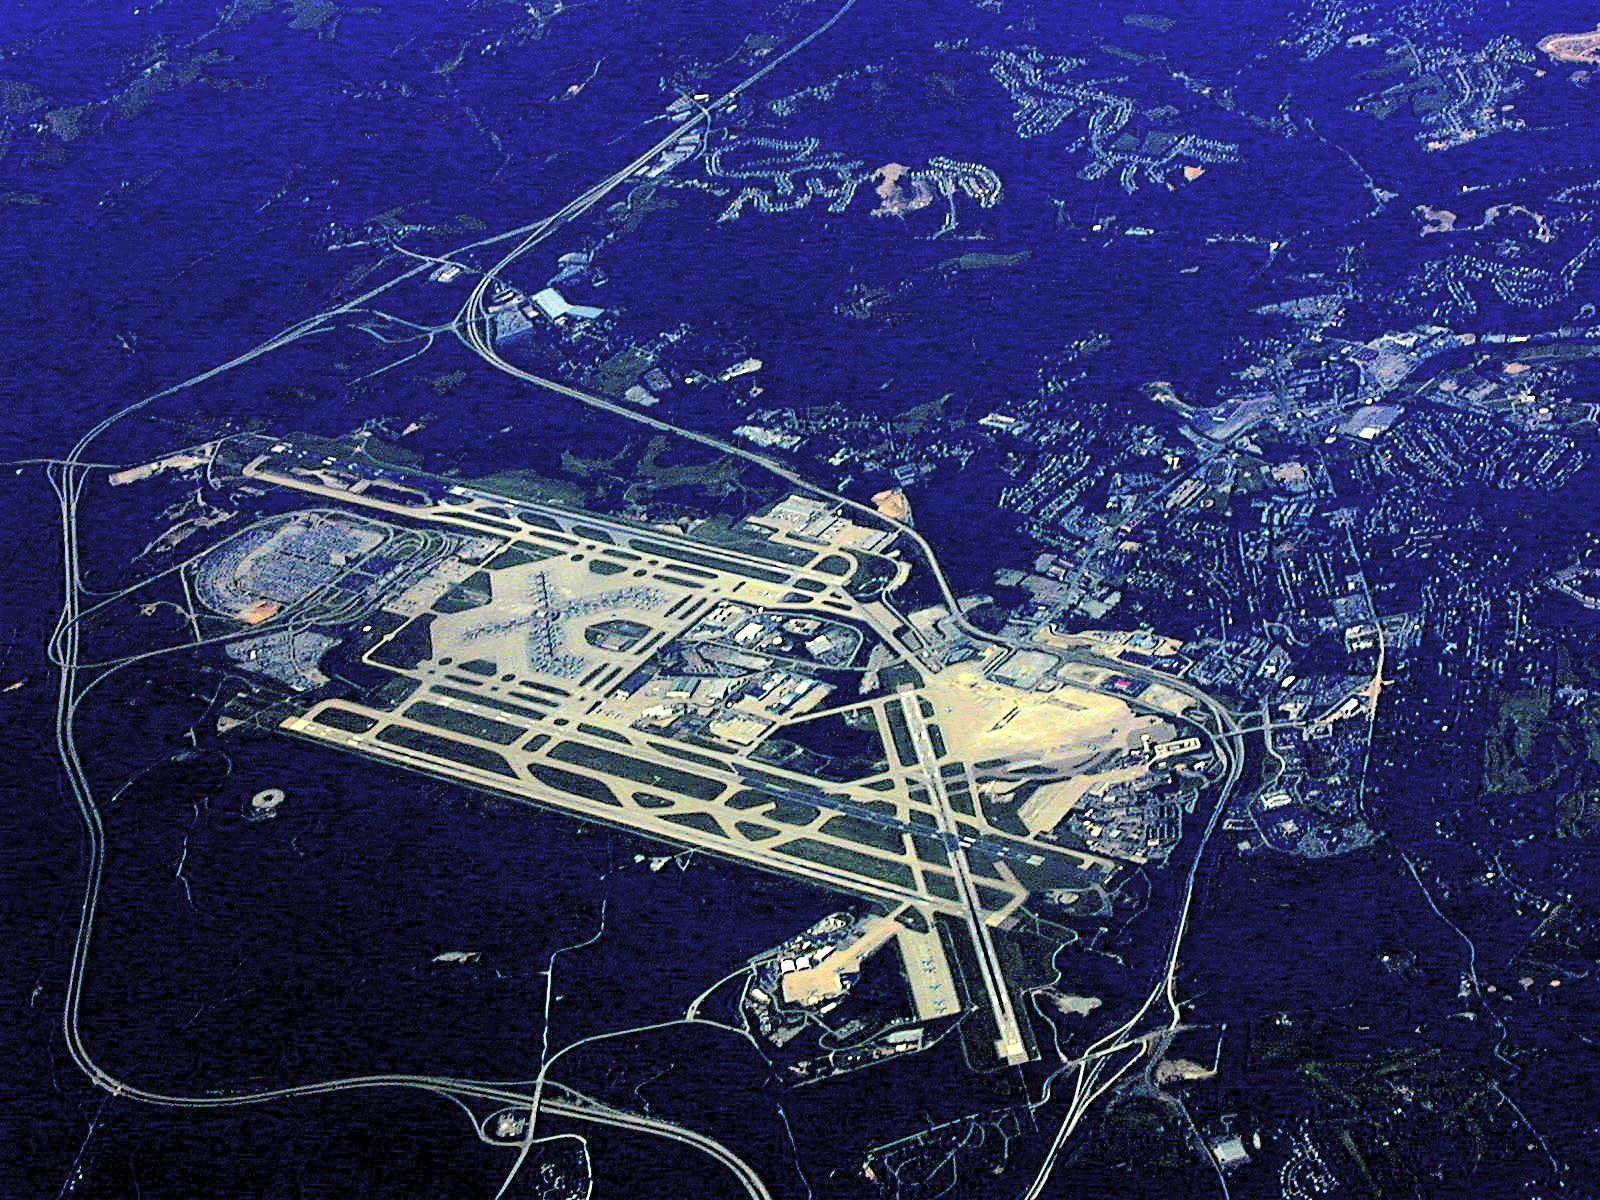 Pittsburgh Airport